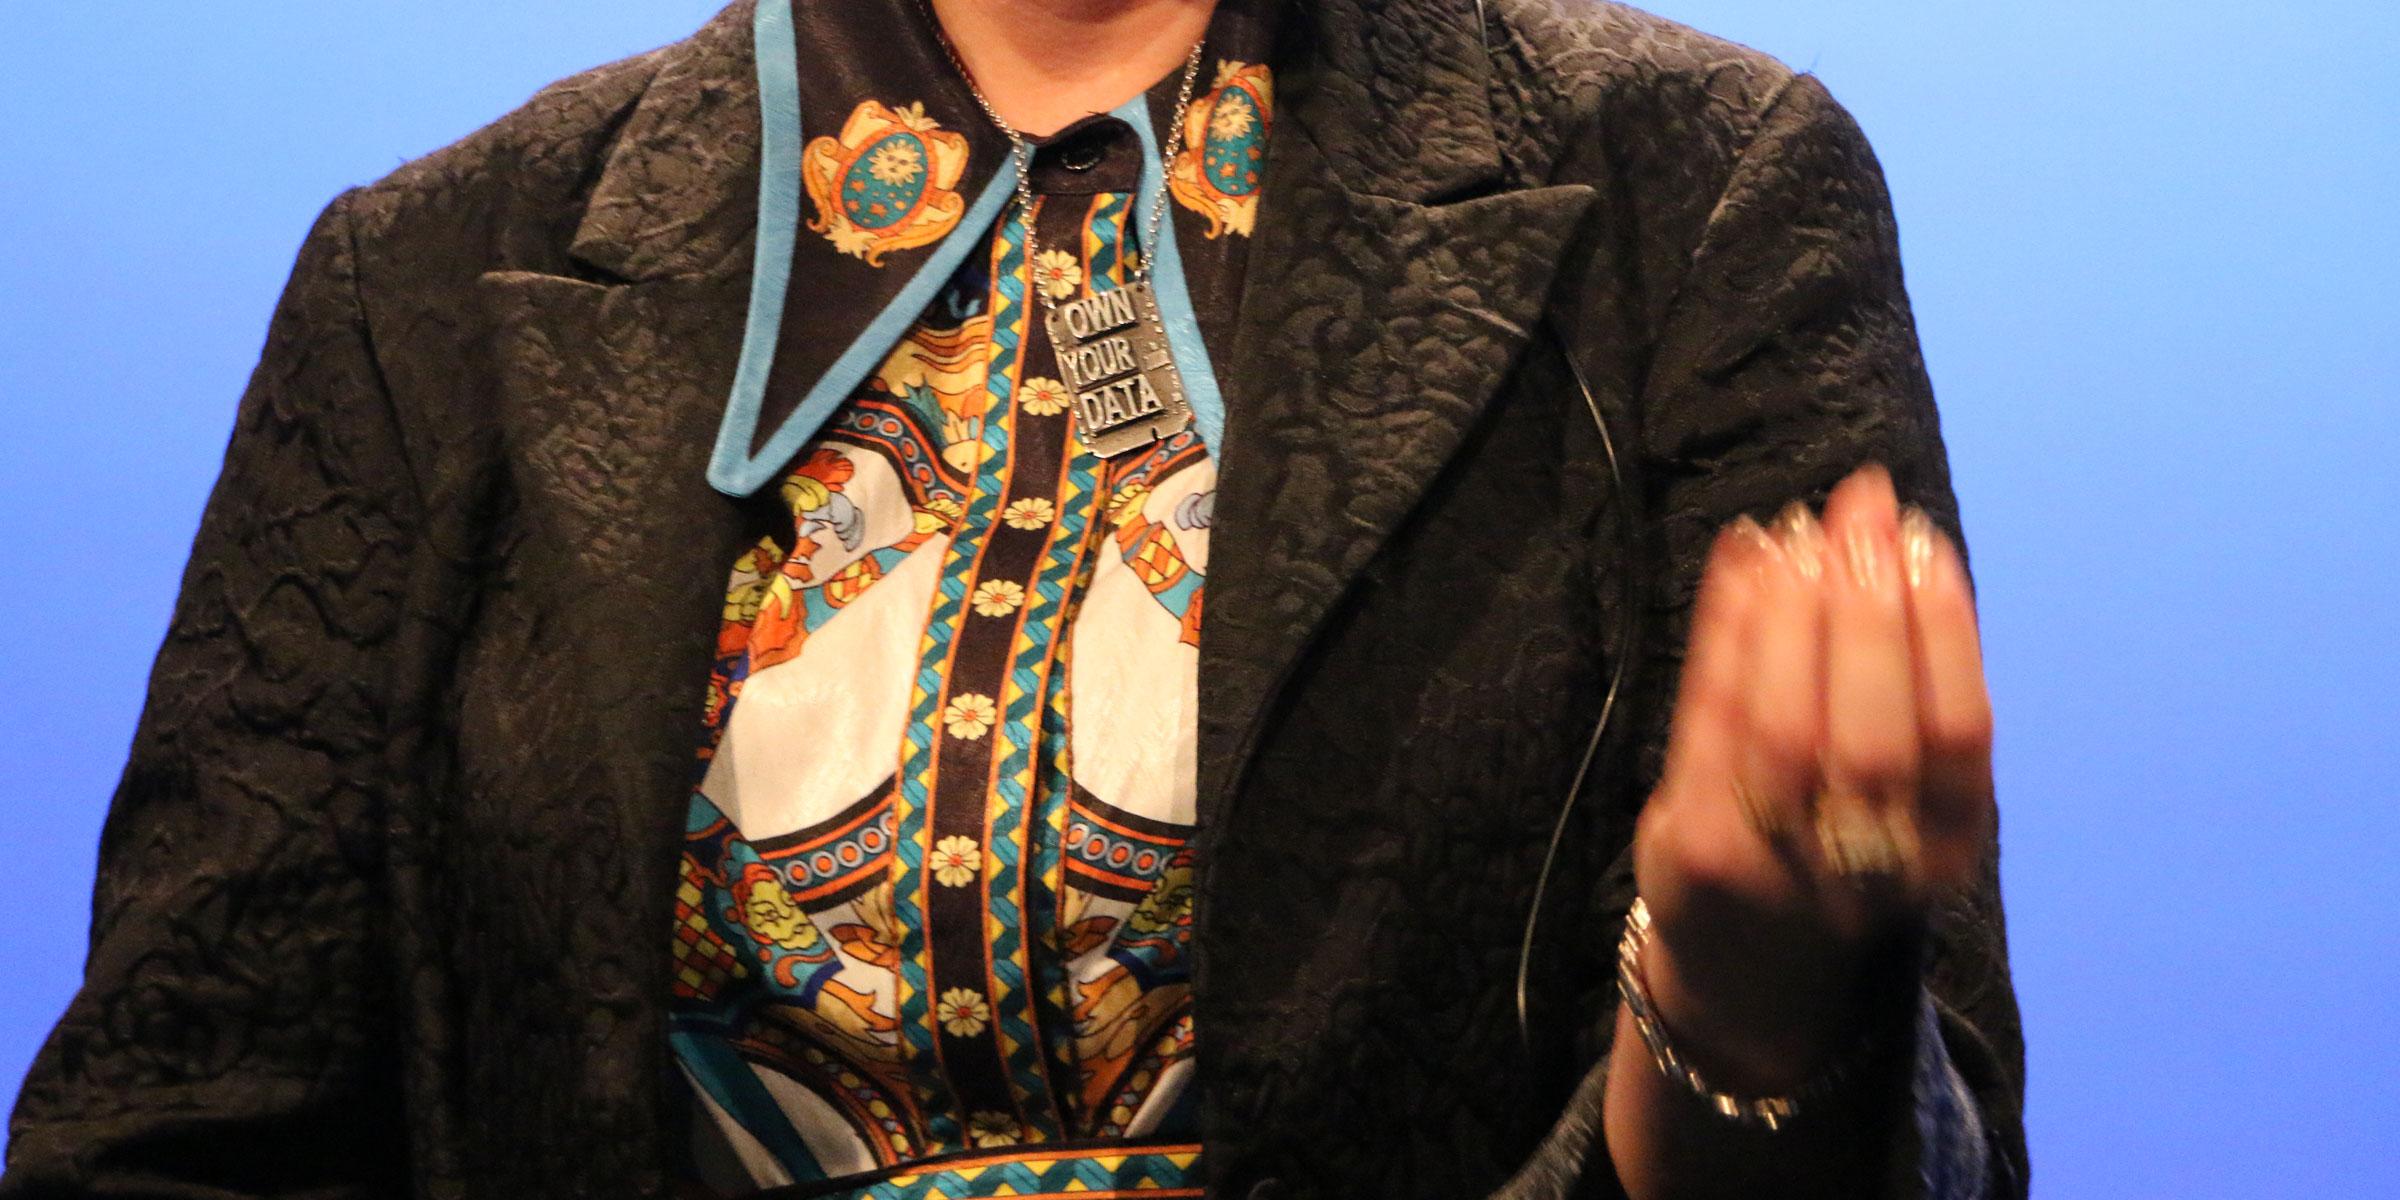 "Brittany Kaisers halsband signalerar tydligt hennes nuvarande uppgift, ""Own your data""."